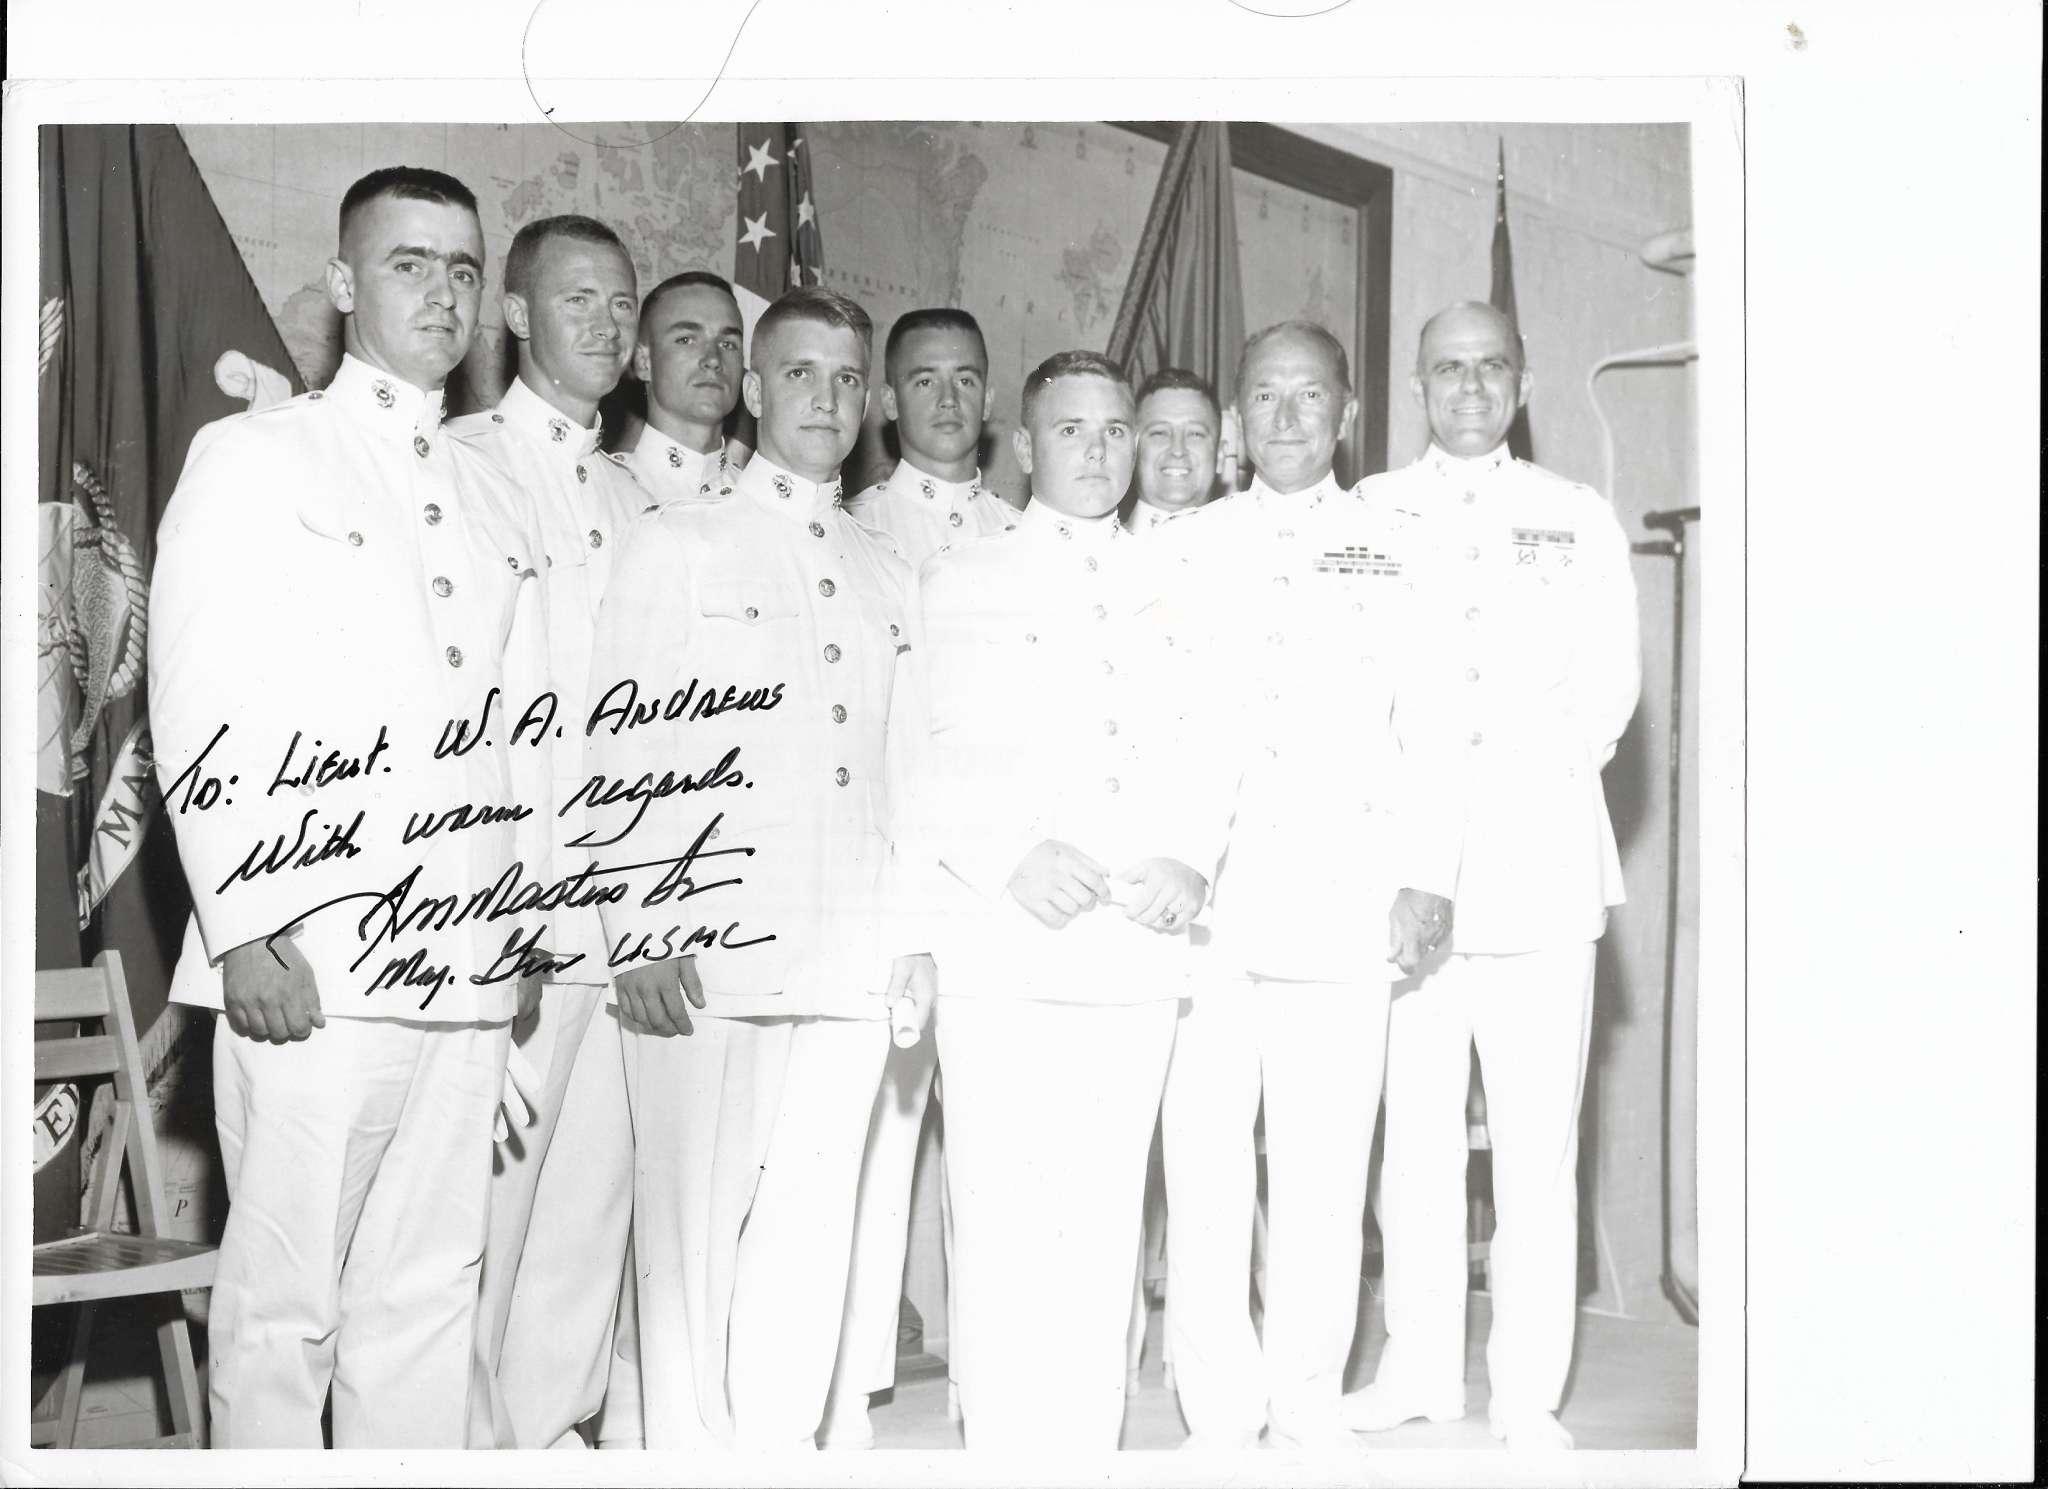 Tulane NROTC Marine Class of 1965